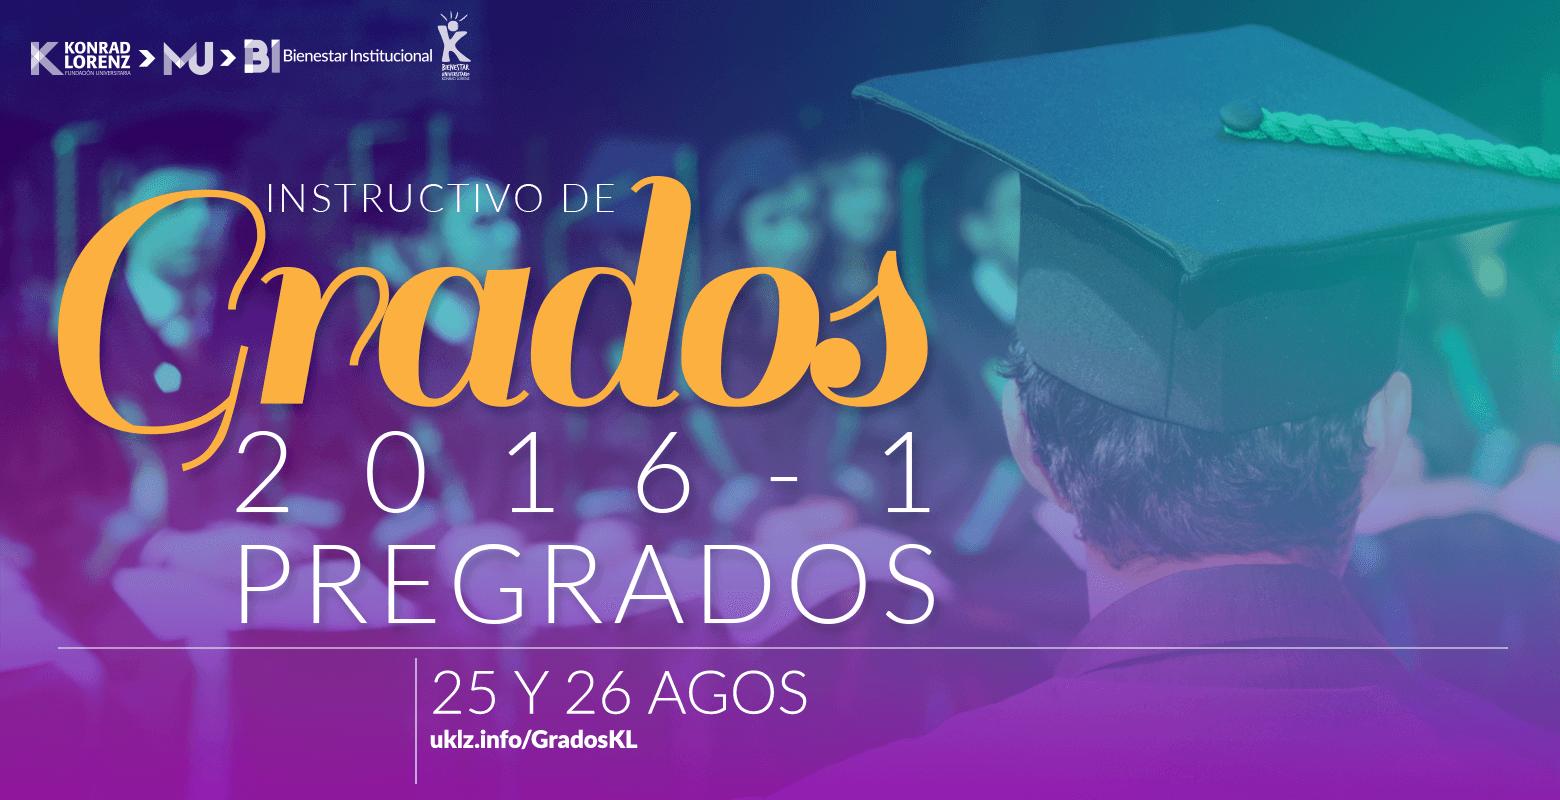 Instructivo de Grados para las Ceremonias de agosto de 2016 (Programas de Pregrado)